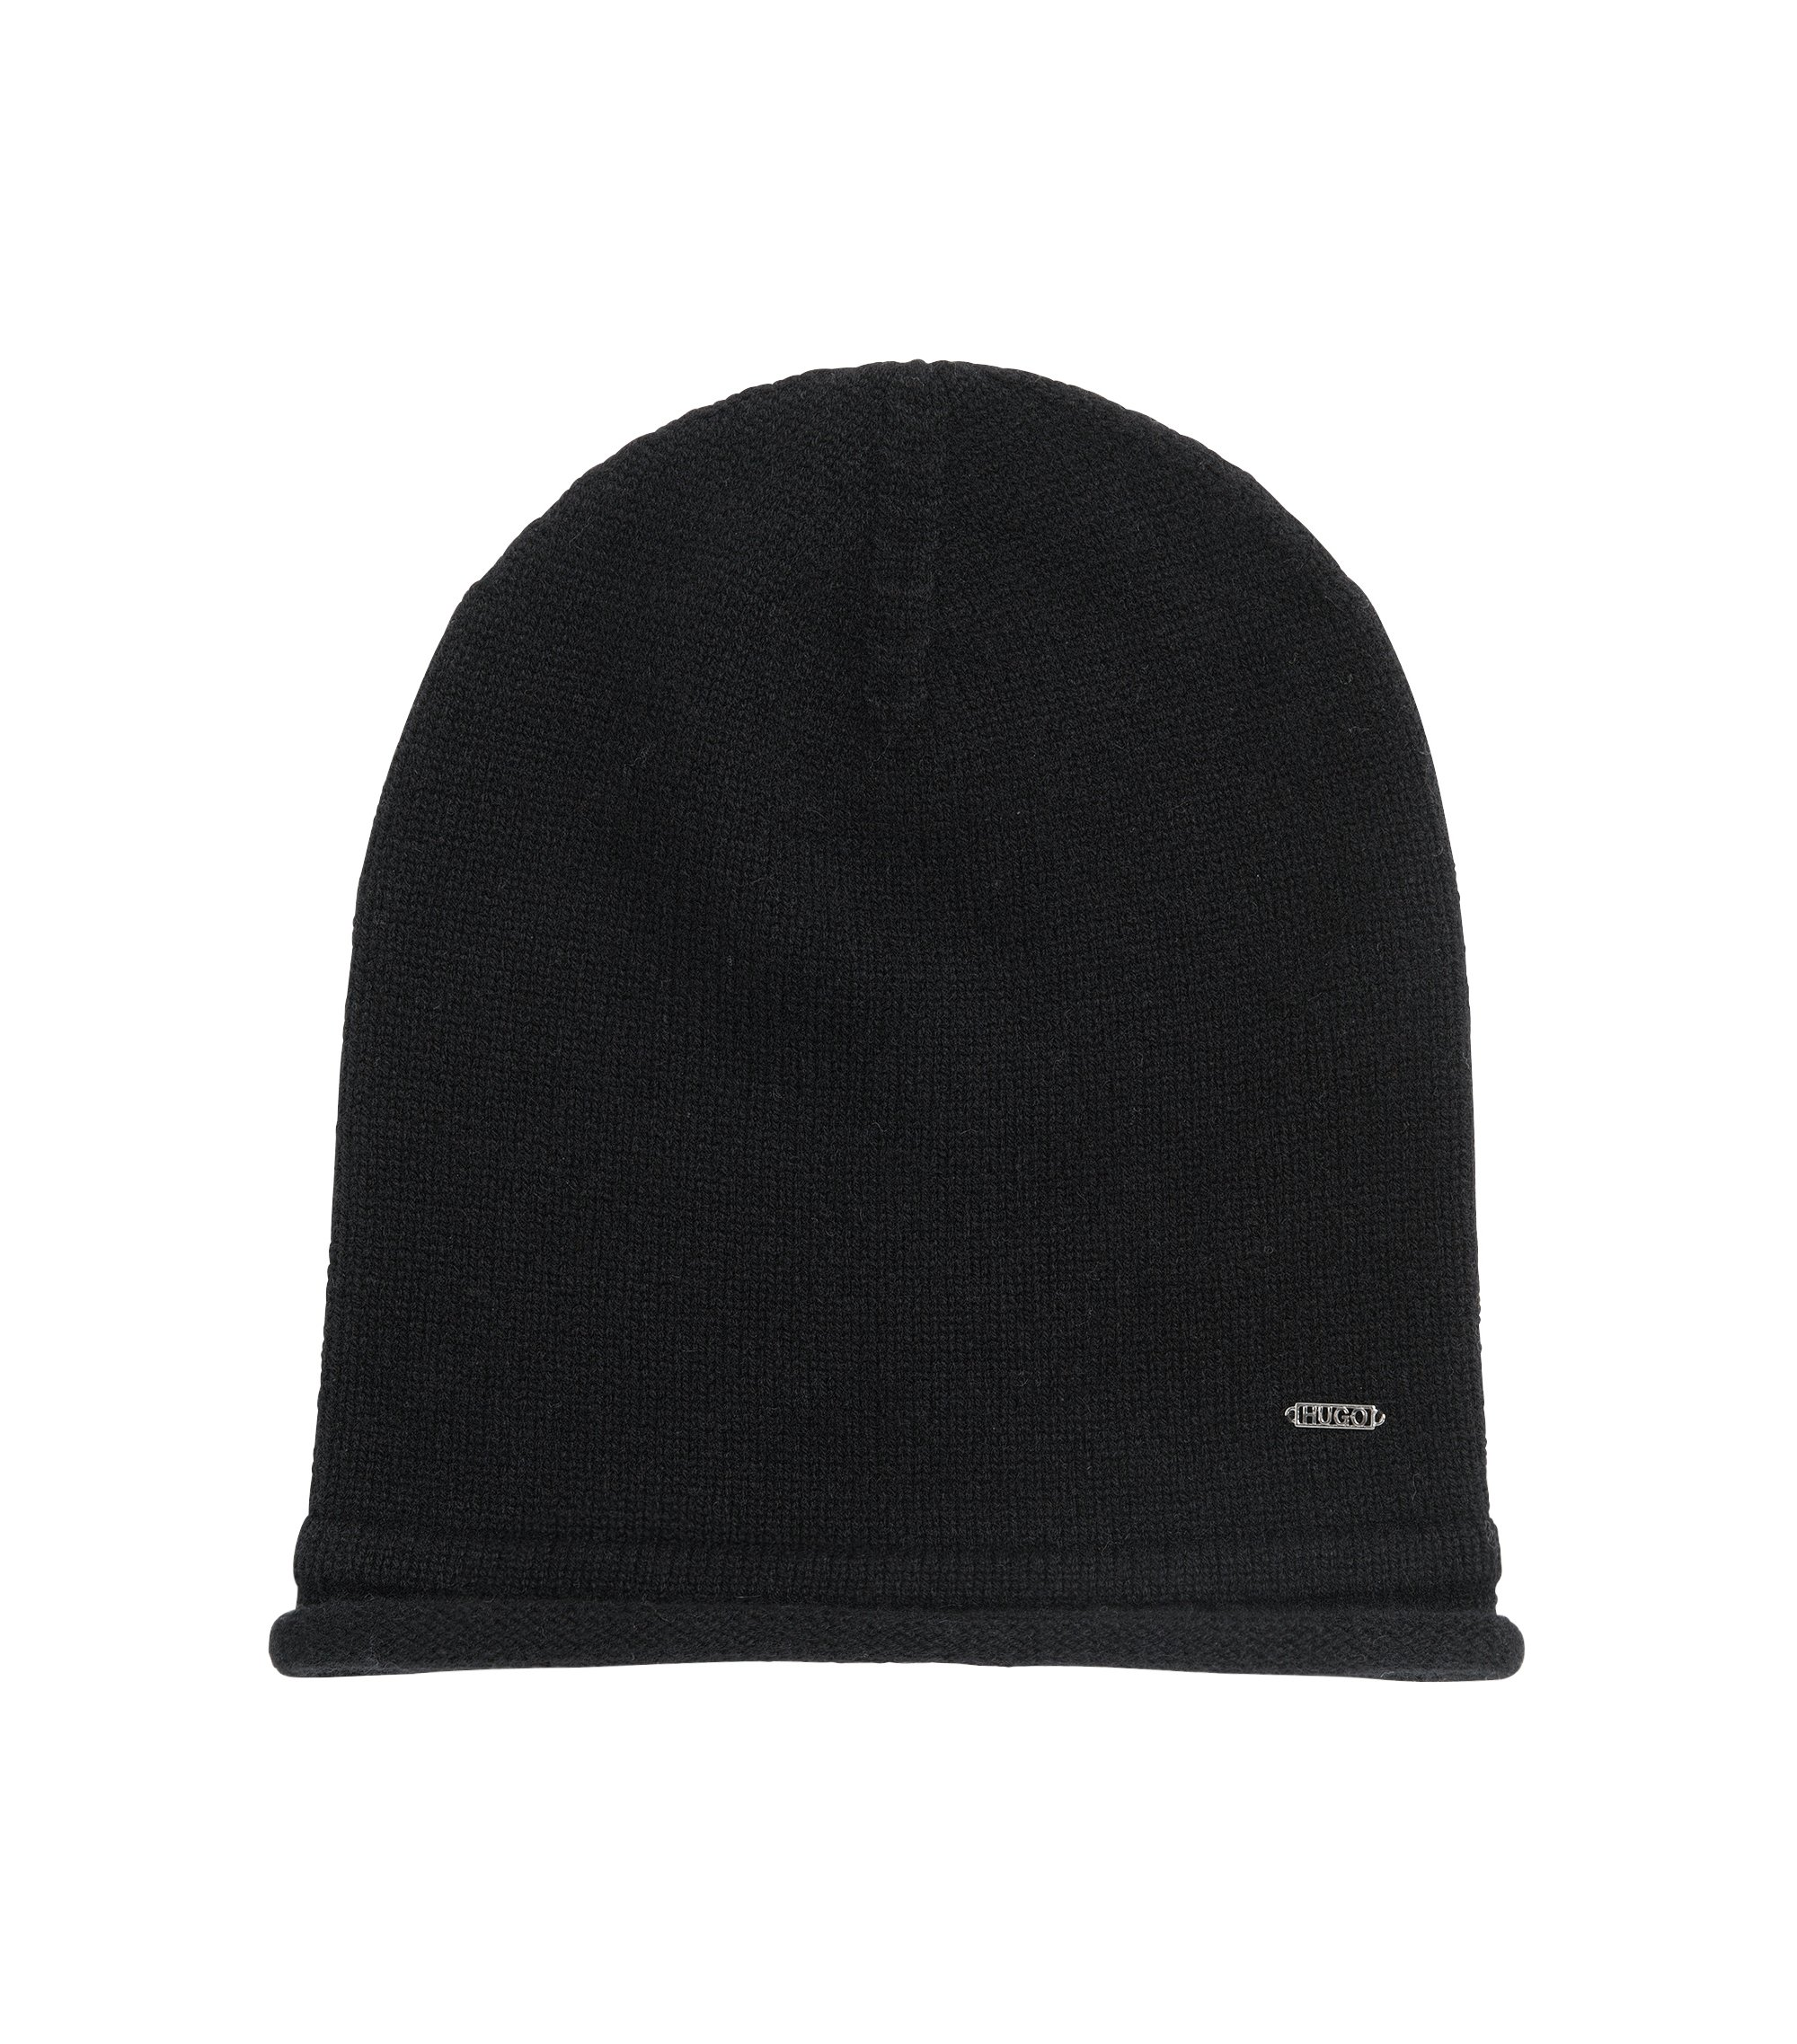 Beanie hat in pure cashmere, Black